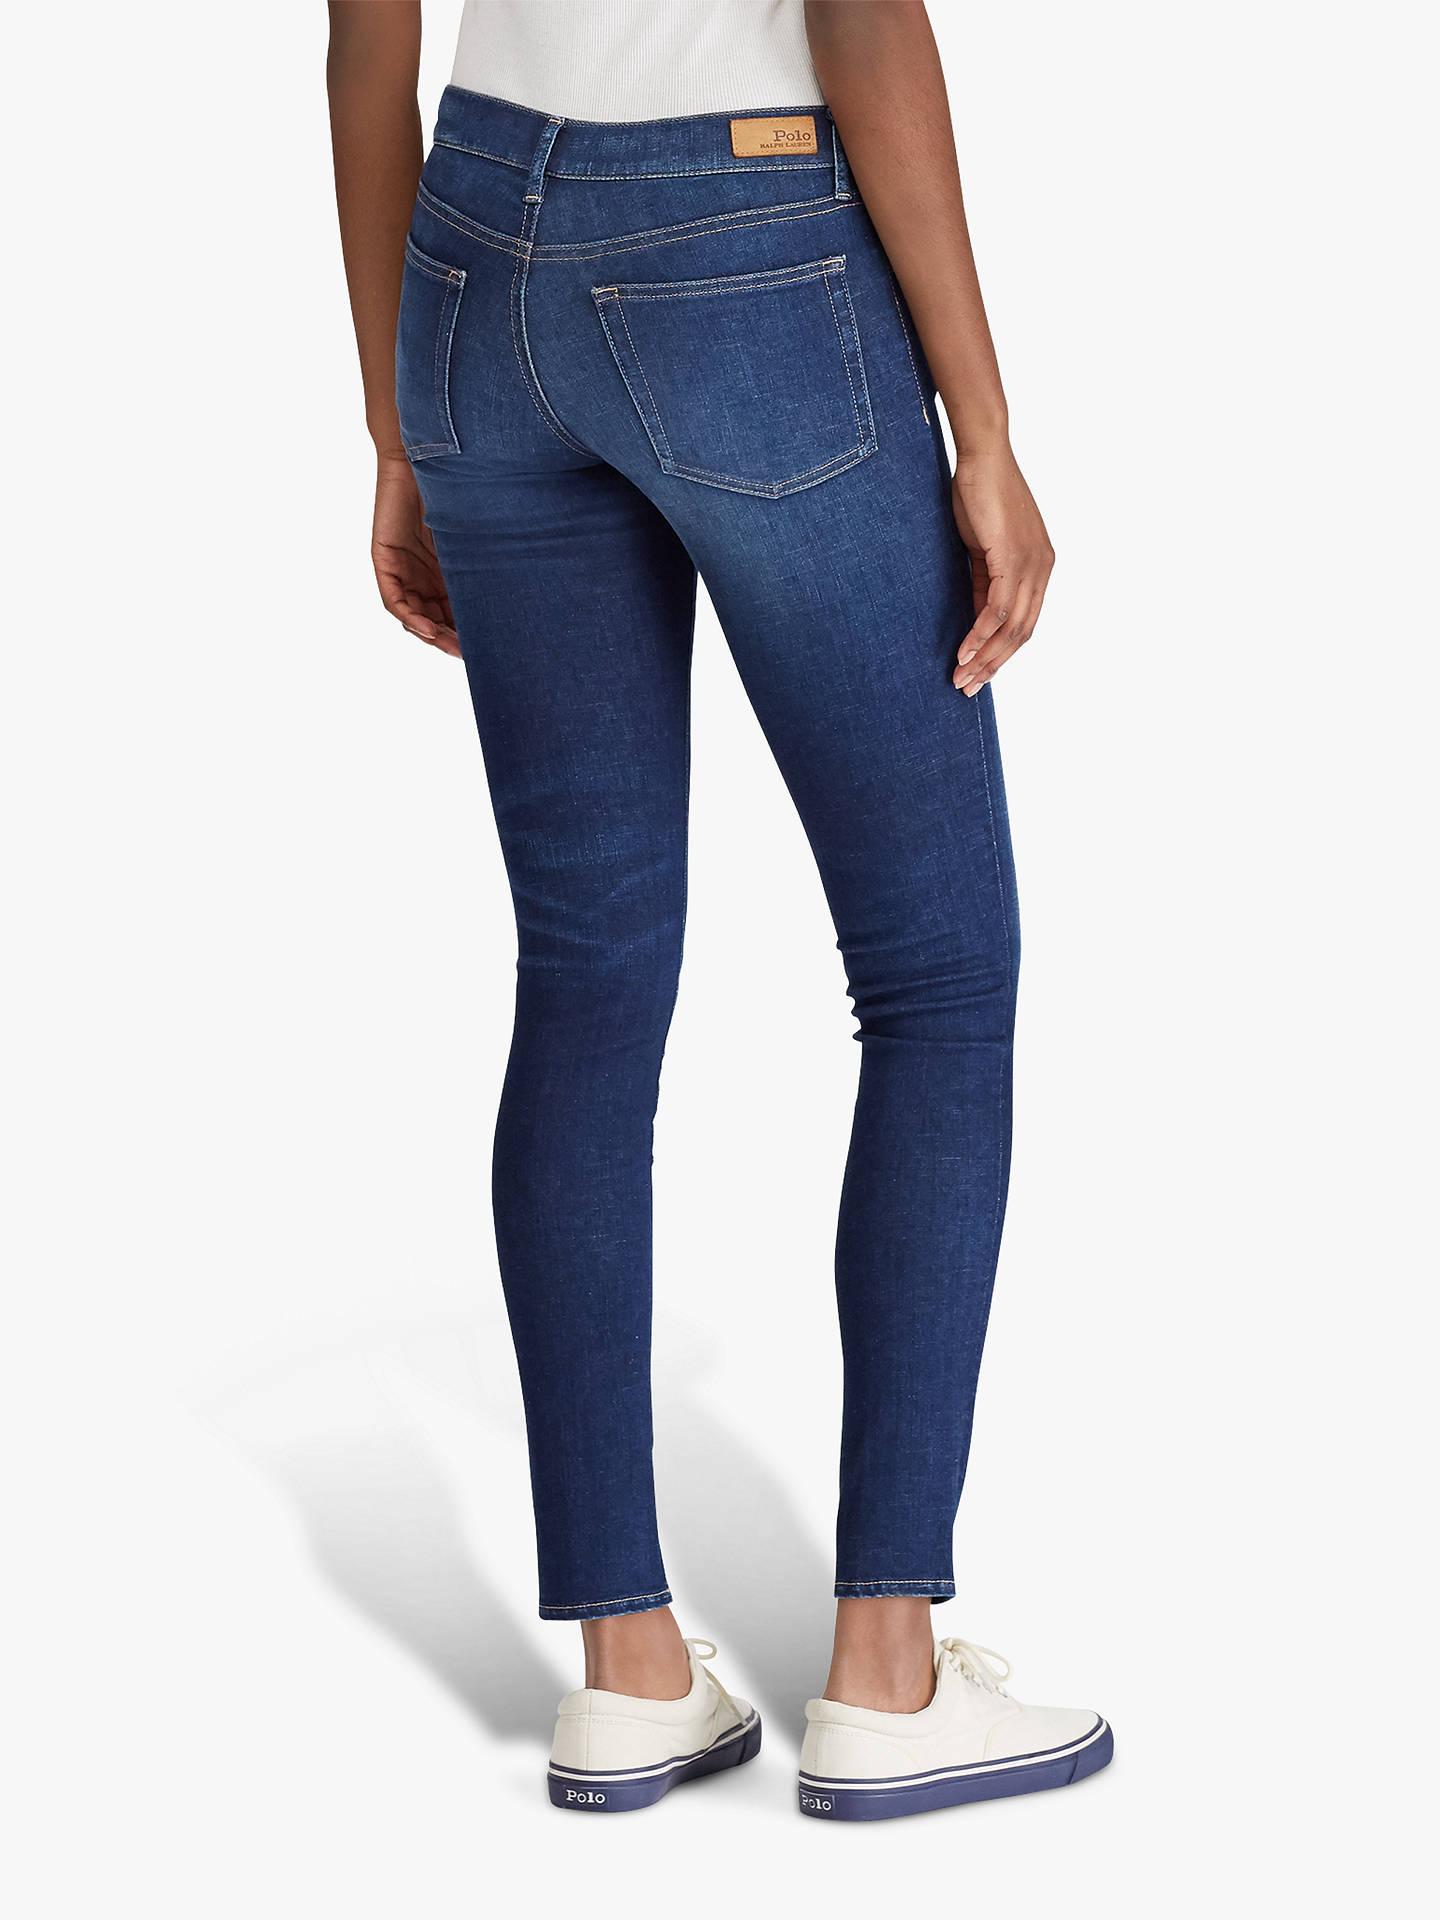 7b0a55acf4 Polo Ralph Lauren Tompkins Skinny Jeans, Dawn Wash at John Lewis ...